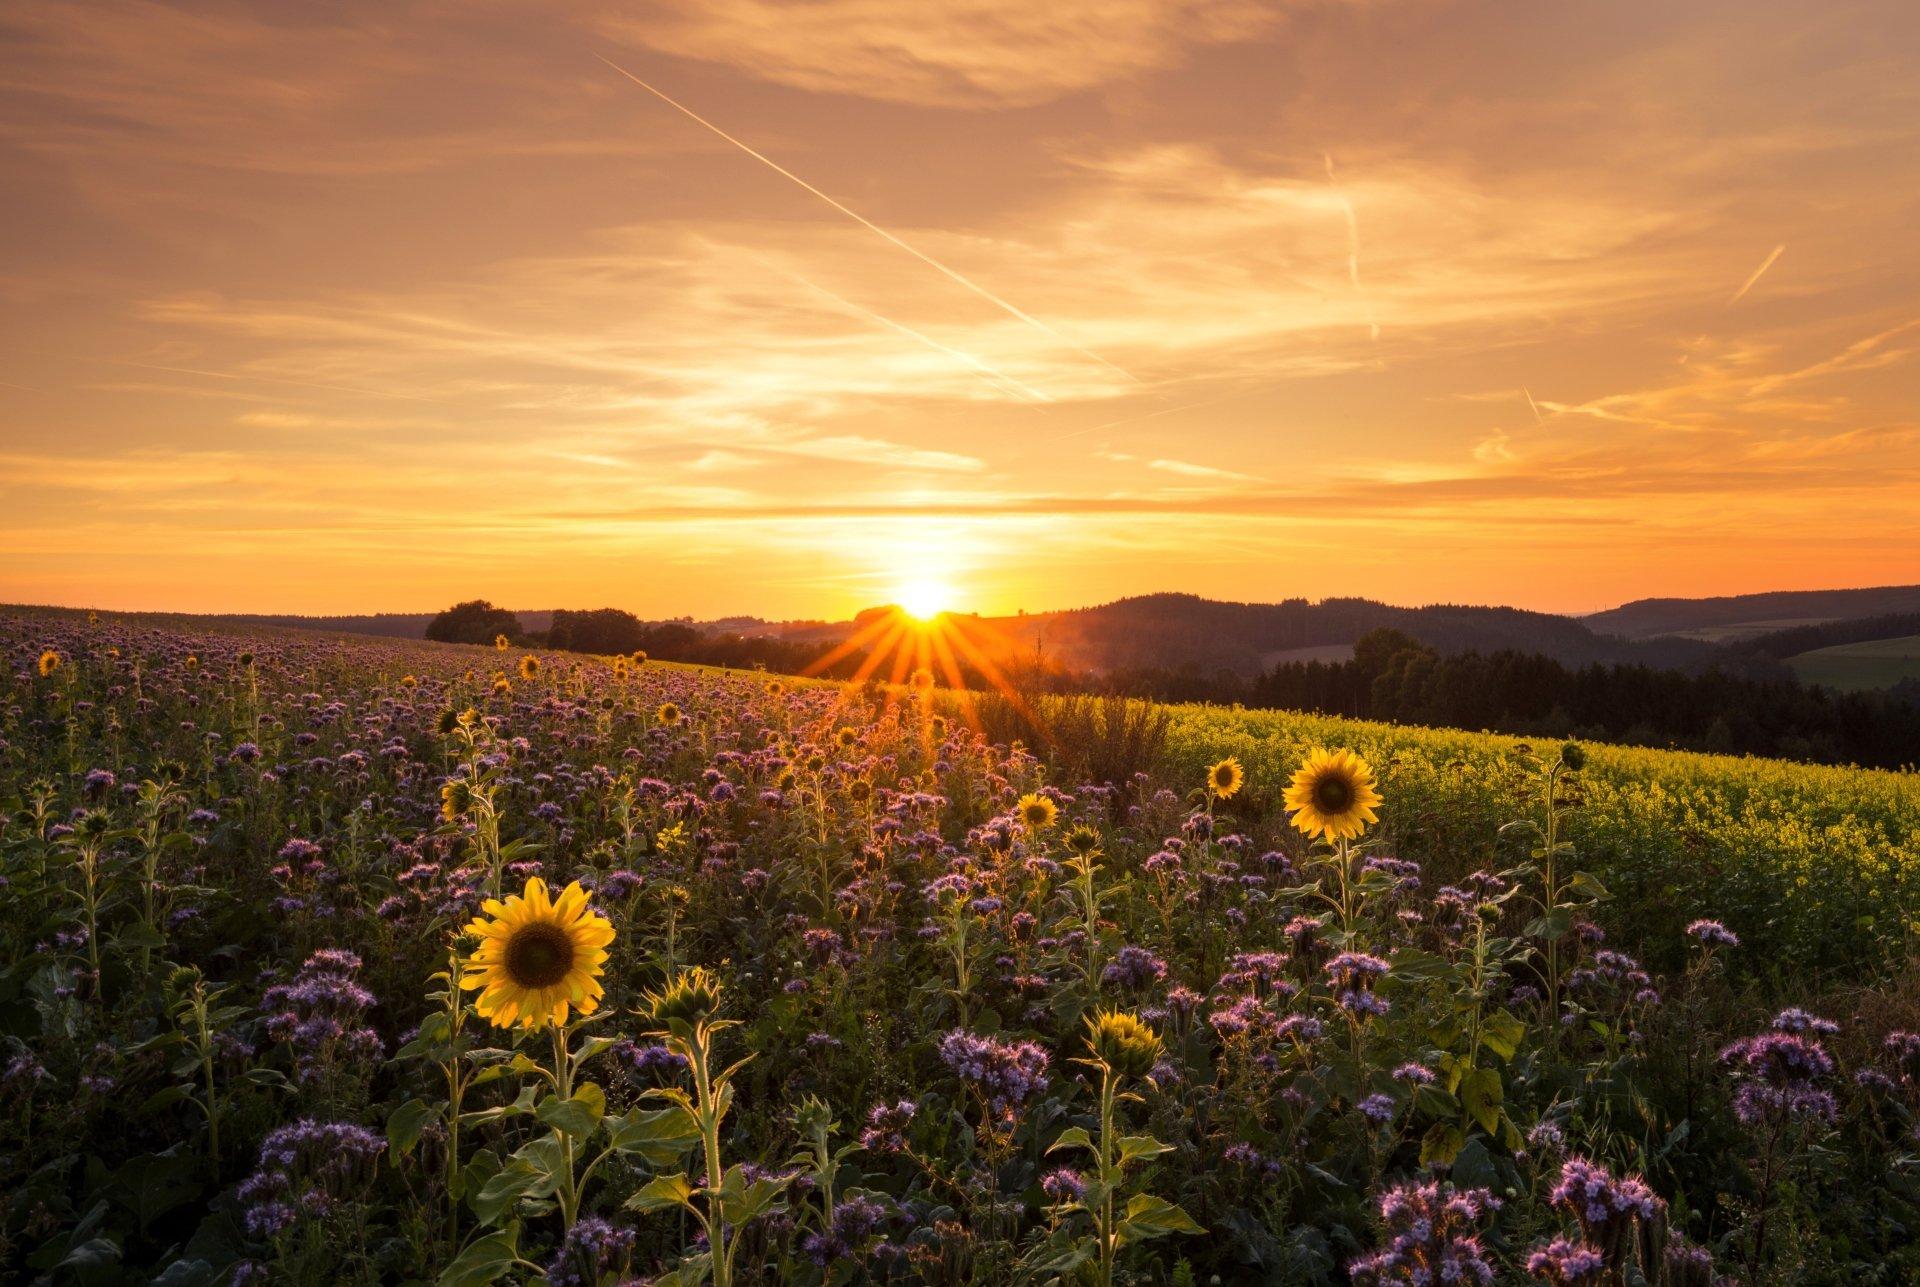 sunrise 4k ultra hd wallpaper and background image